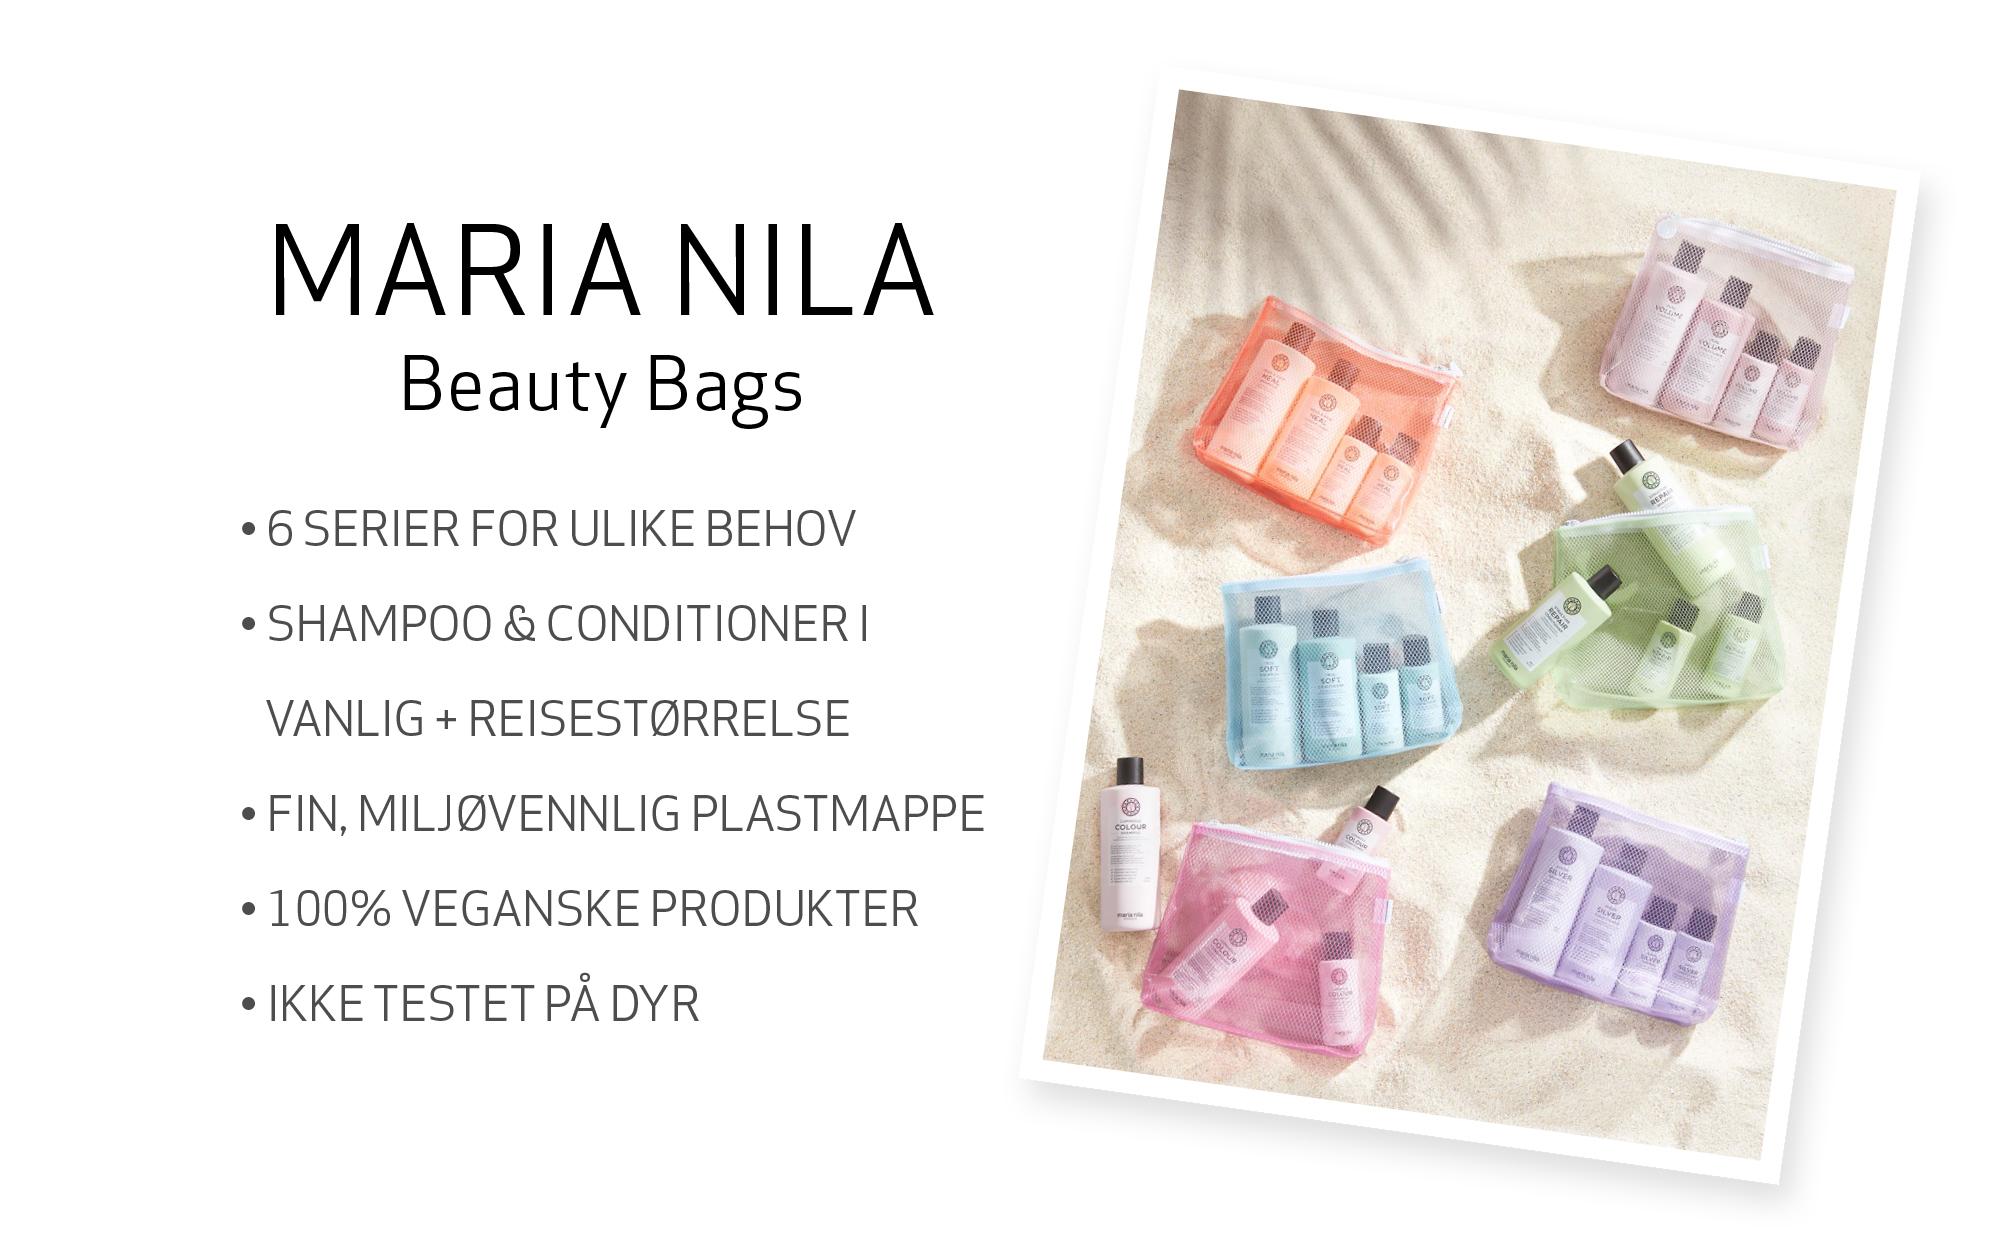 Maria Nila Beauty Bags 2020